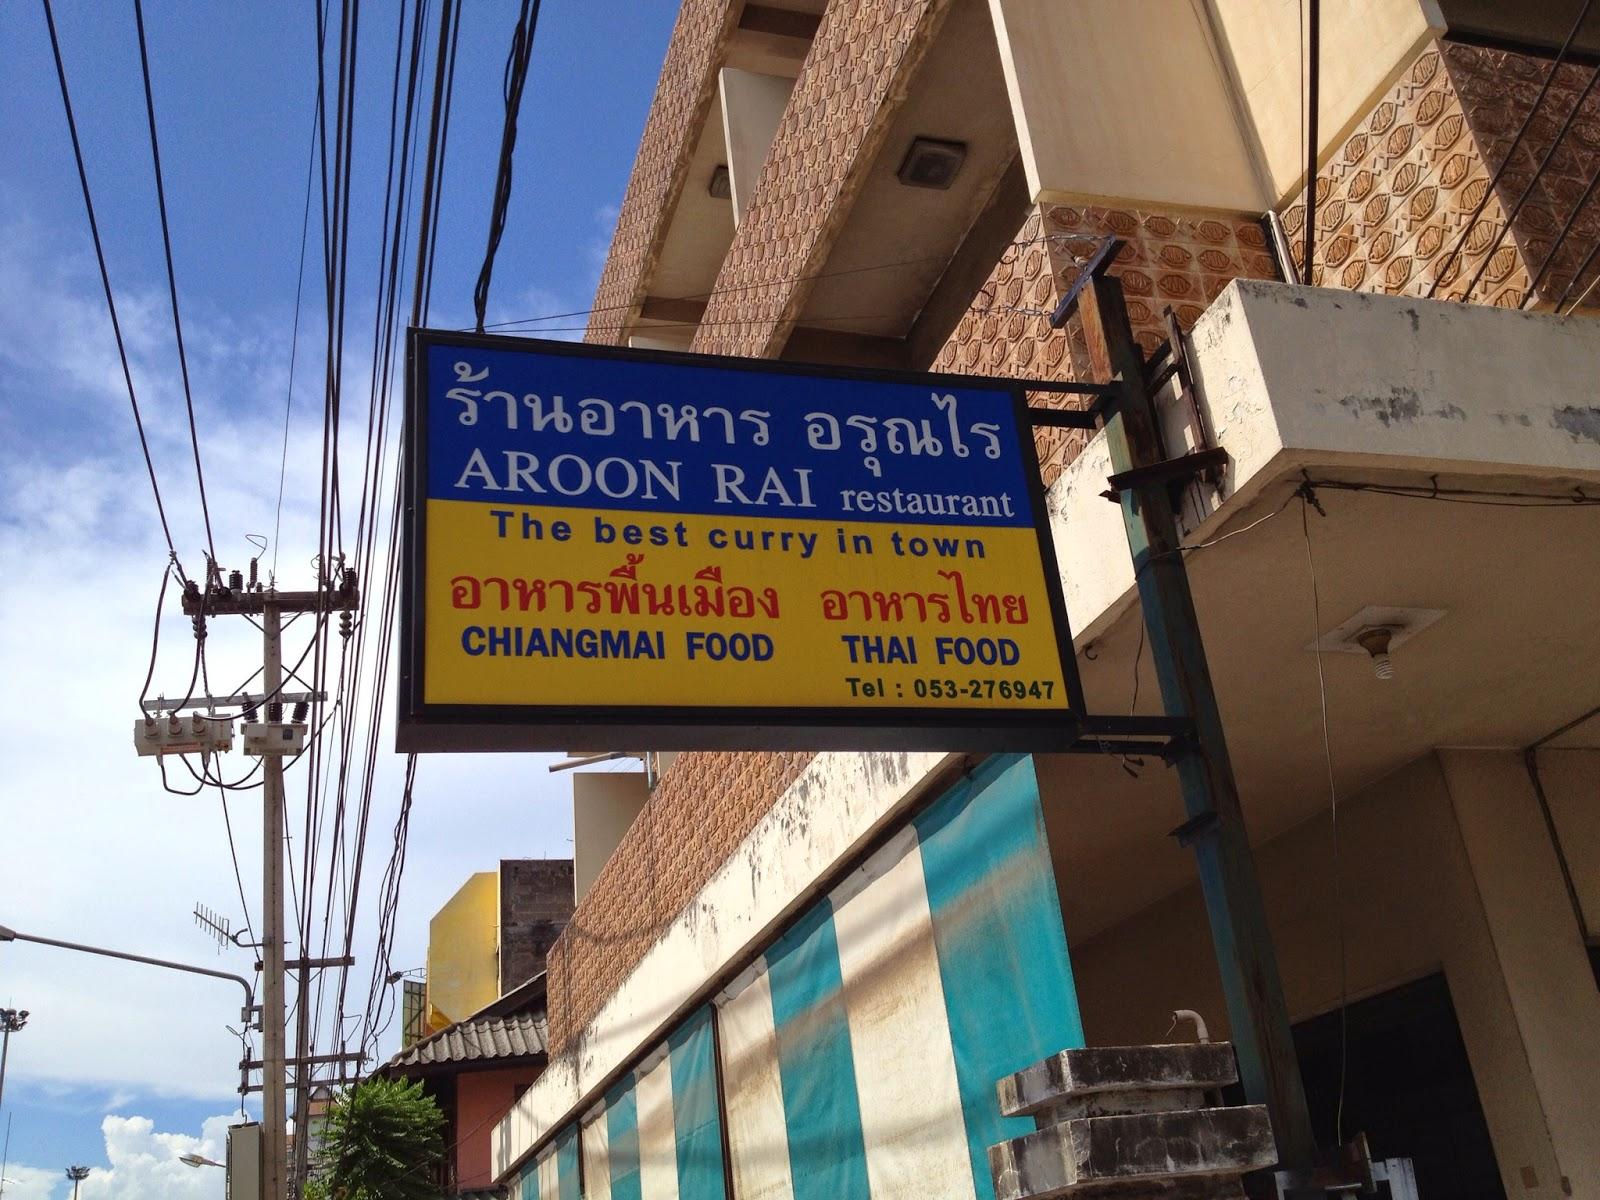 Chiang Mai - Khoa soi at Aroon Rai was spicy (for me)